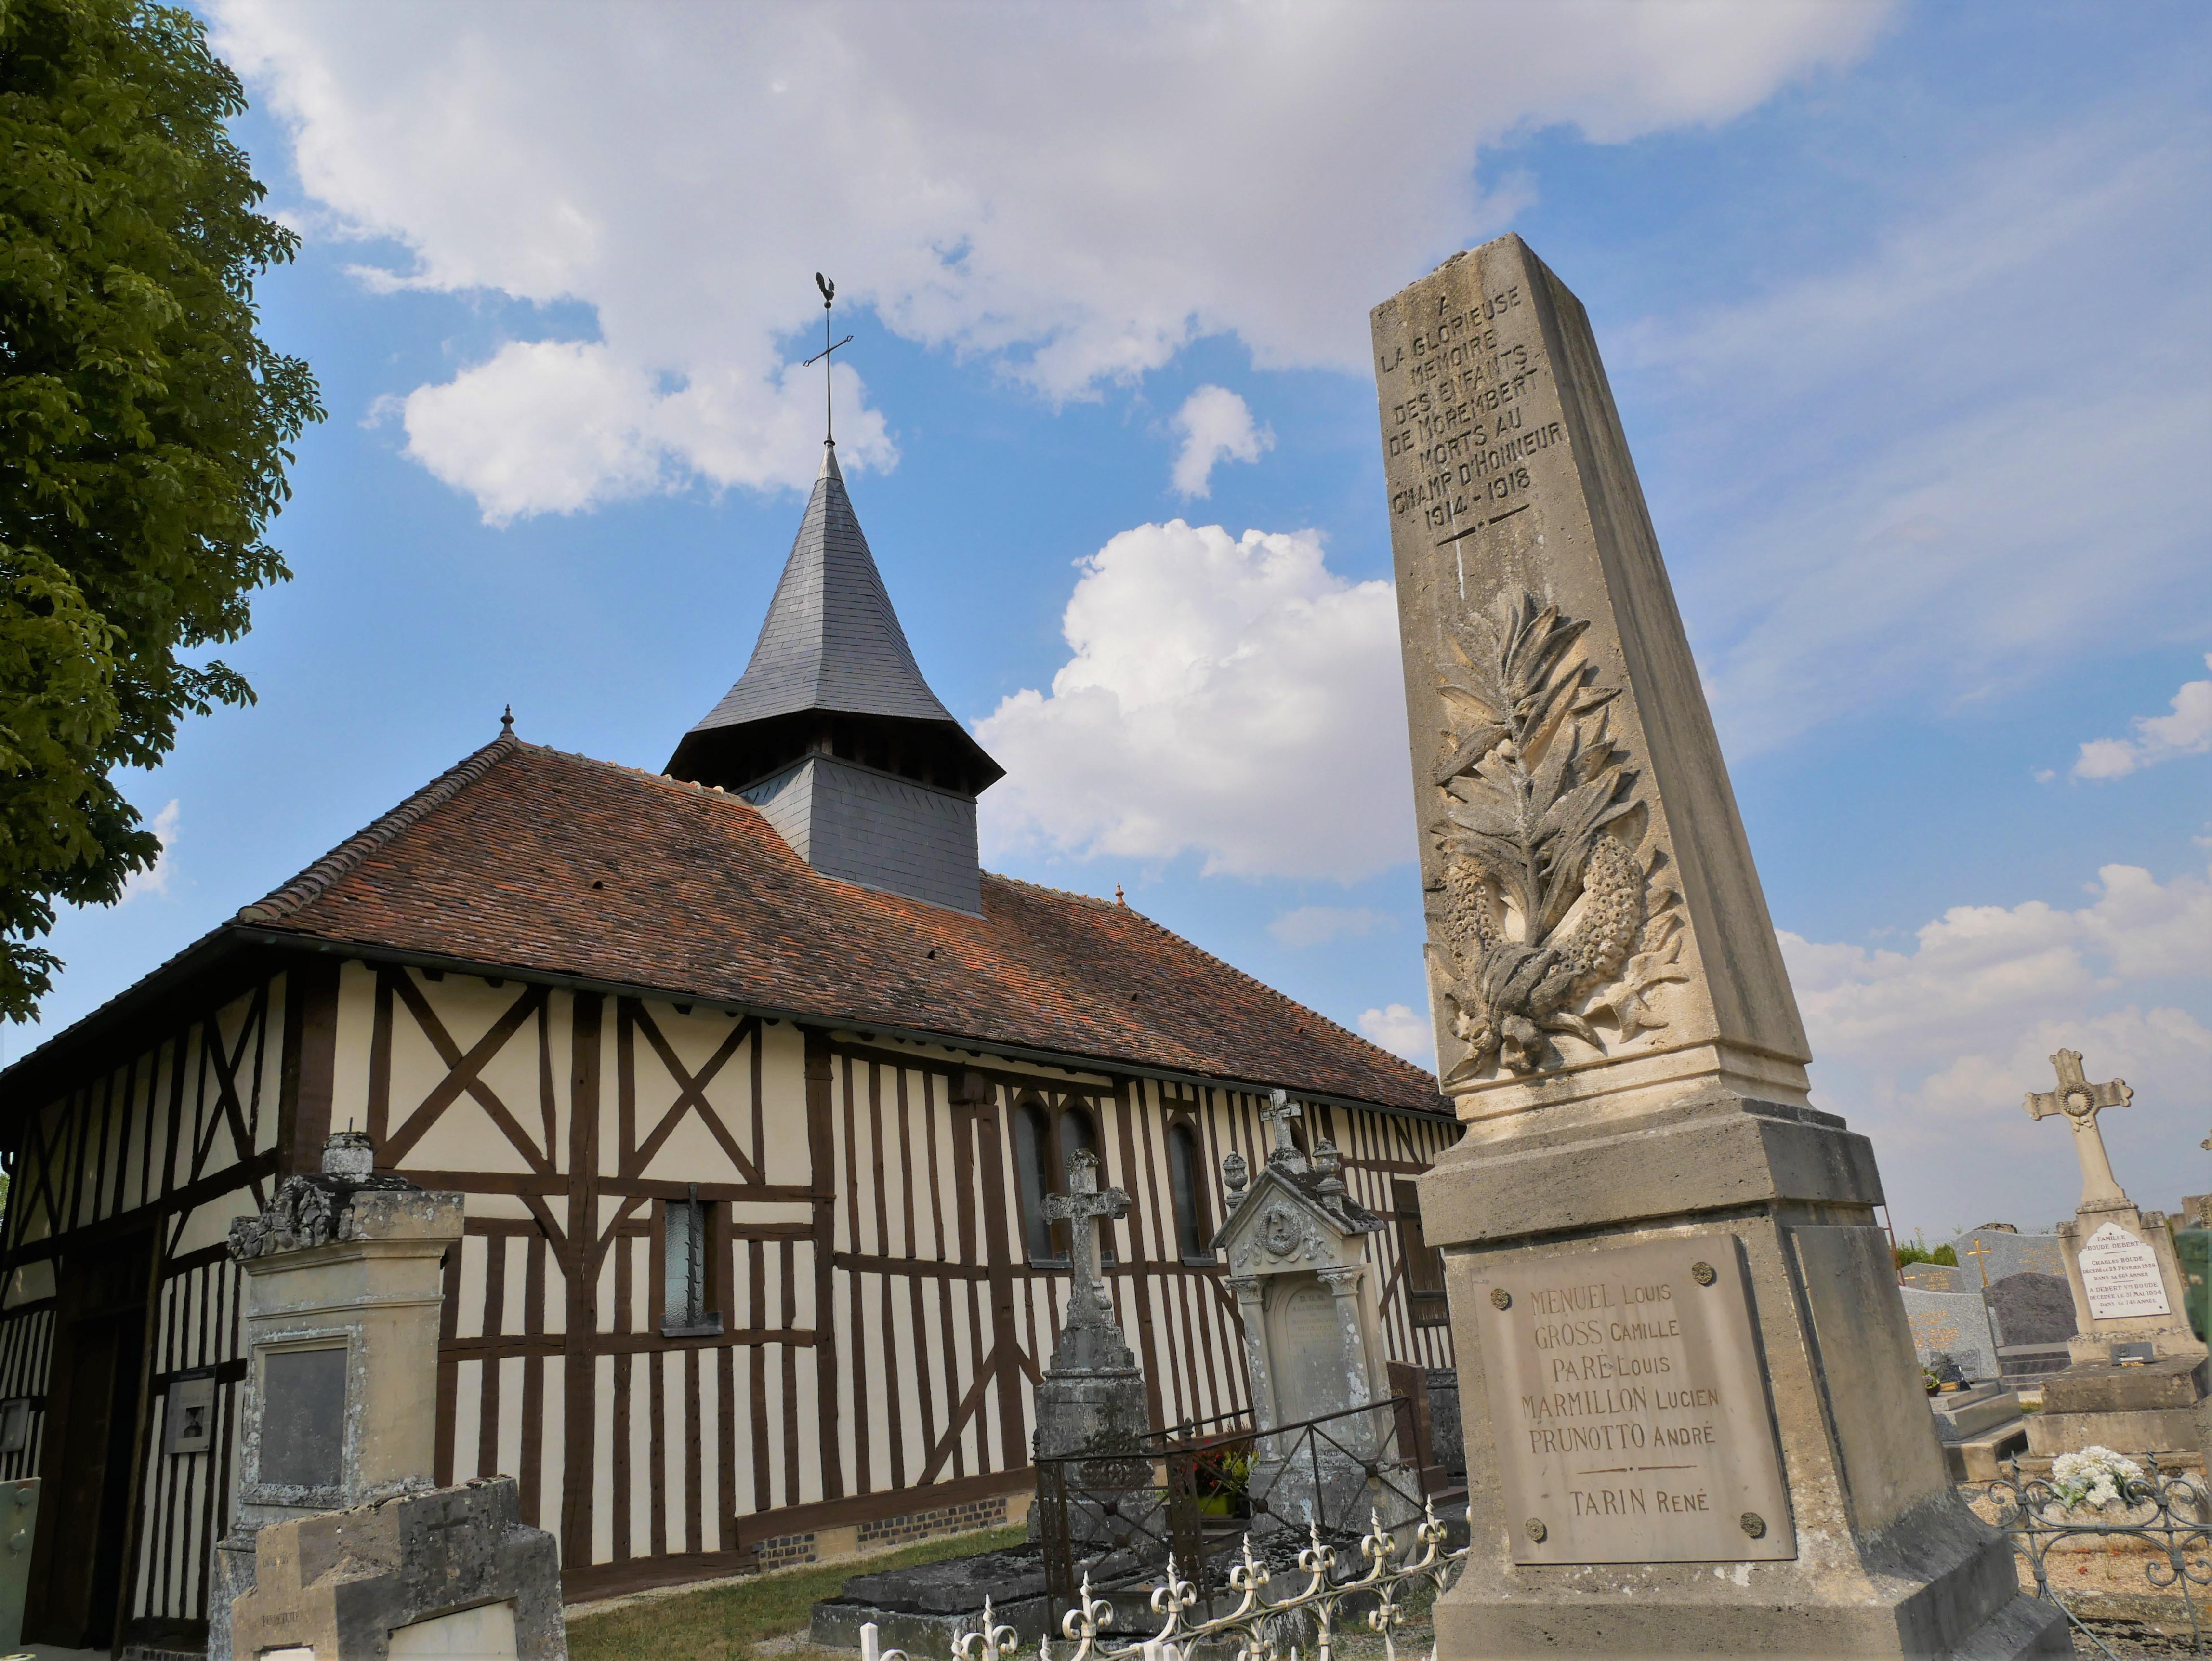 Eglise Saint Jean Baptiste de Morembert